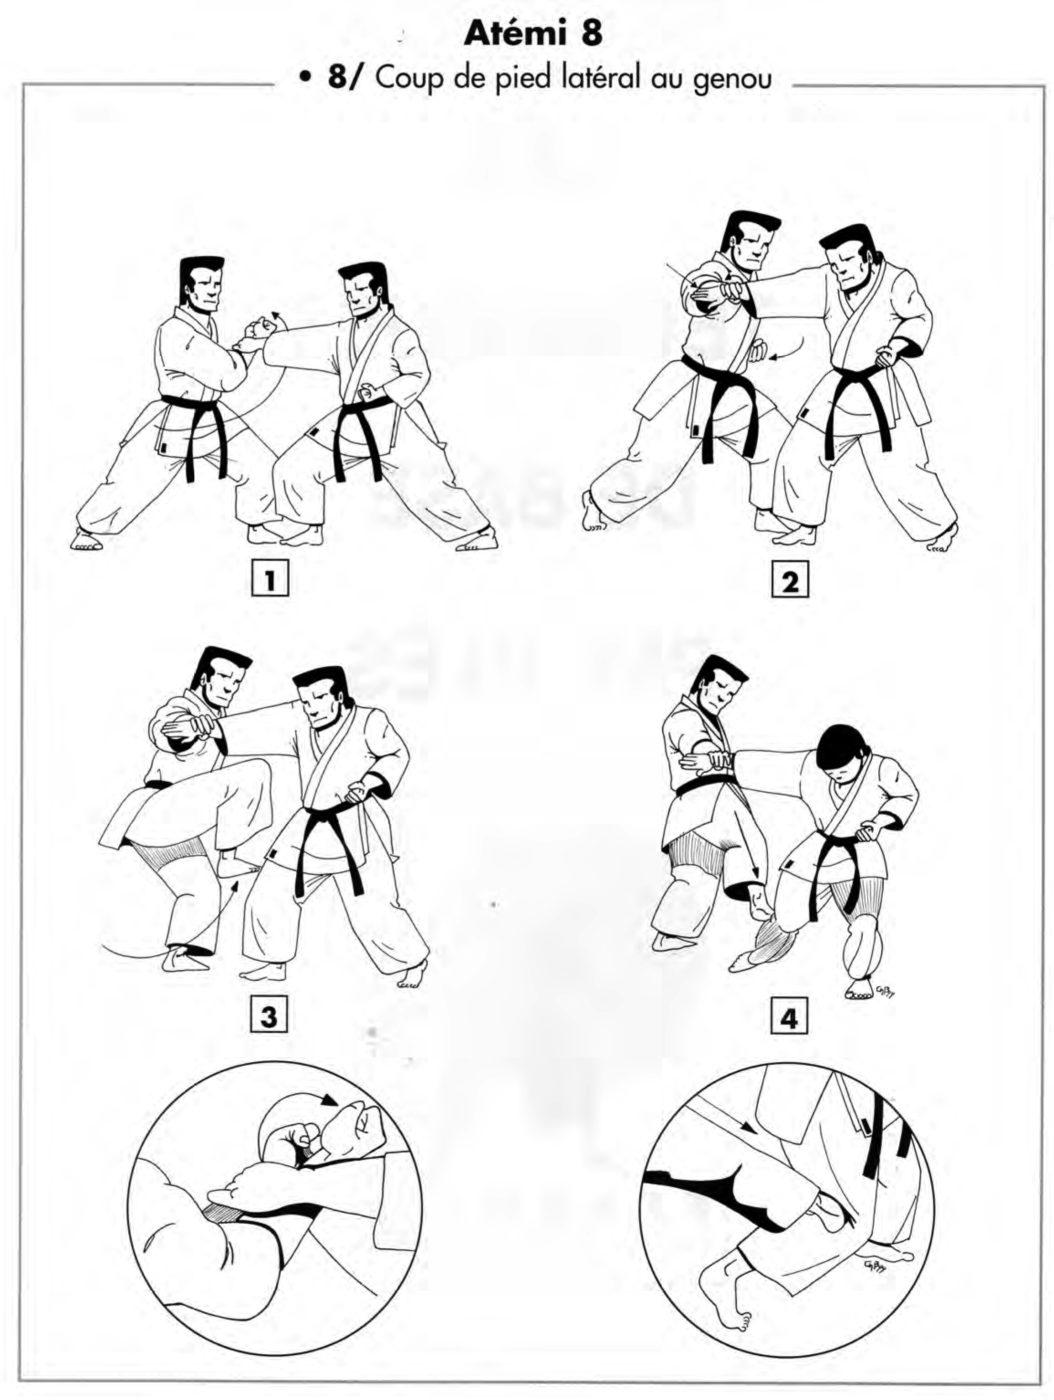 Atemi : yoko fumikomi – coup de pied latéral au genou